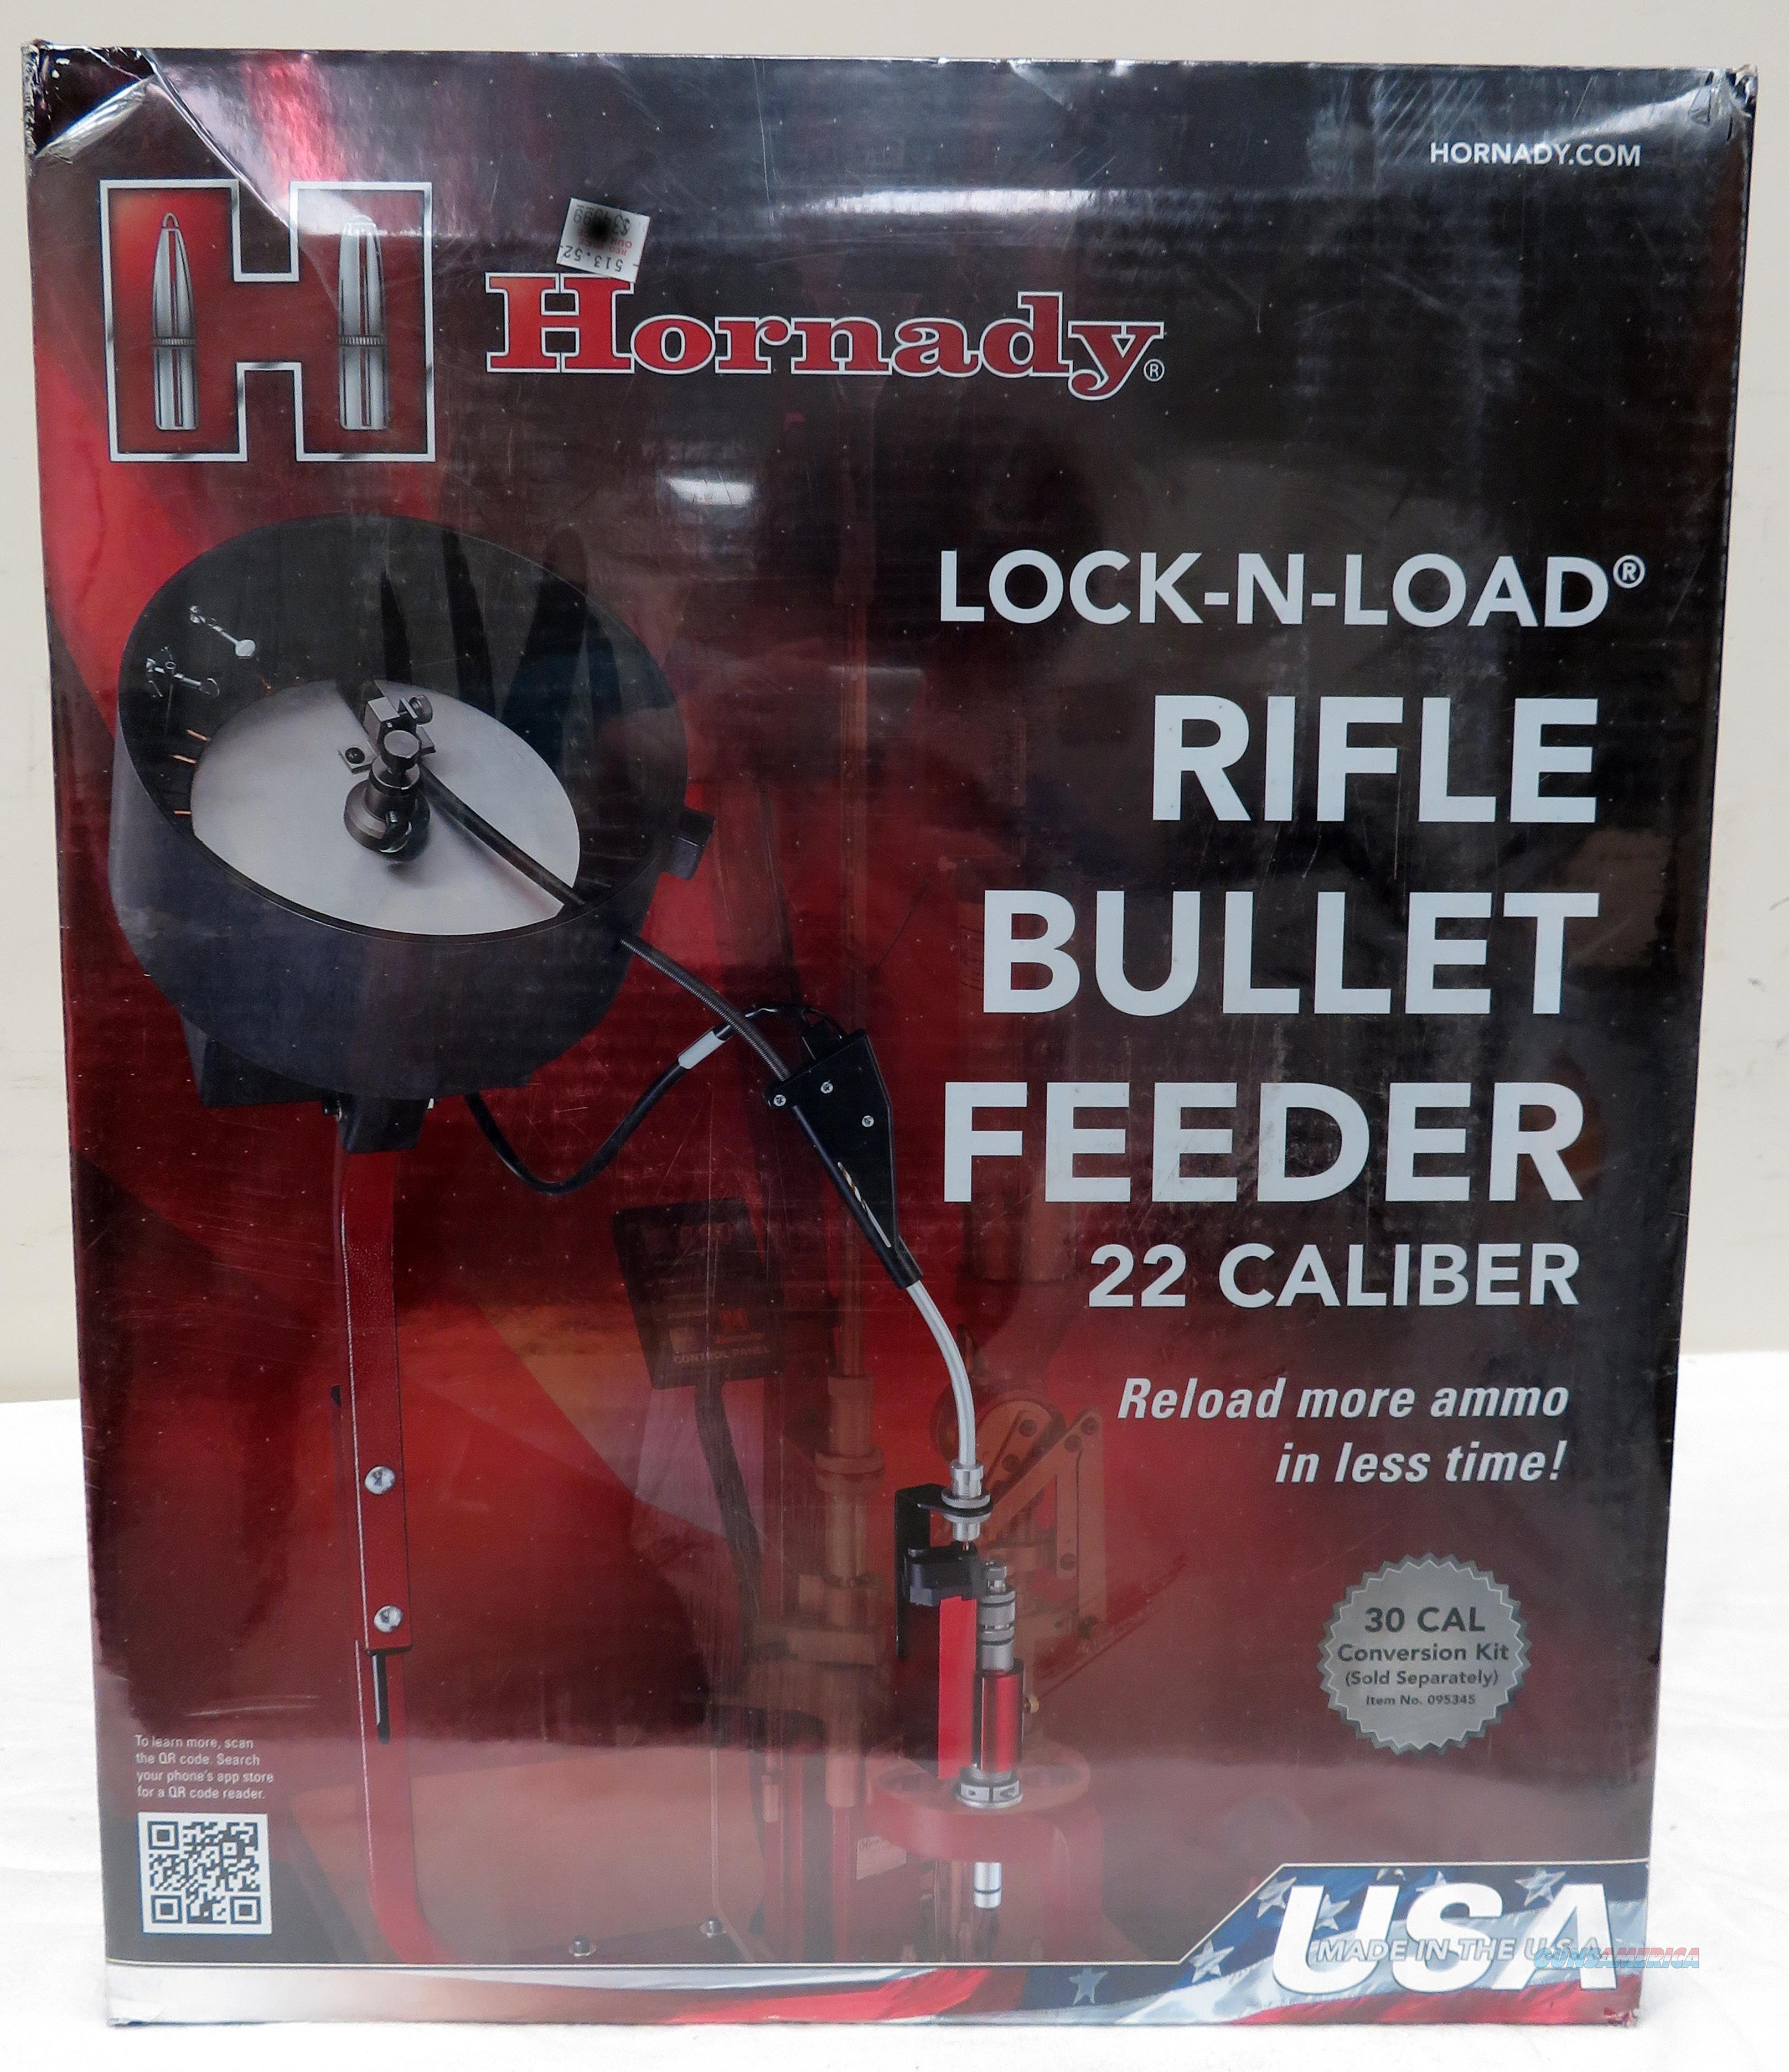 HORNADY RIFLE BULLET FEEDER .22 CAL (FOR Lock-N-Load® AP PRESS) 095340  Non-Guns > Reloading > Equipment > Metallic > Presses